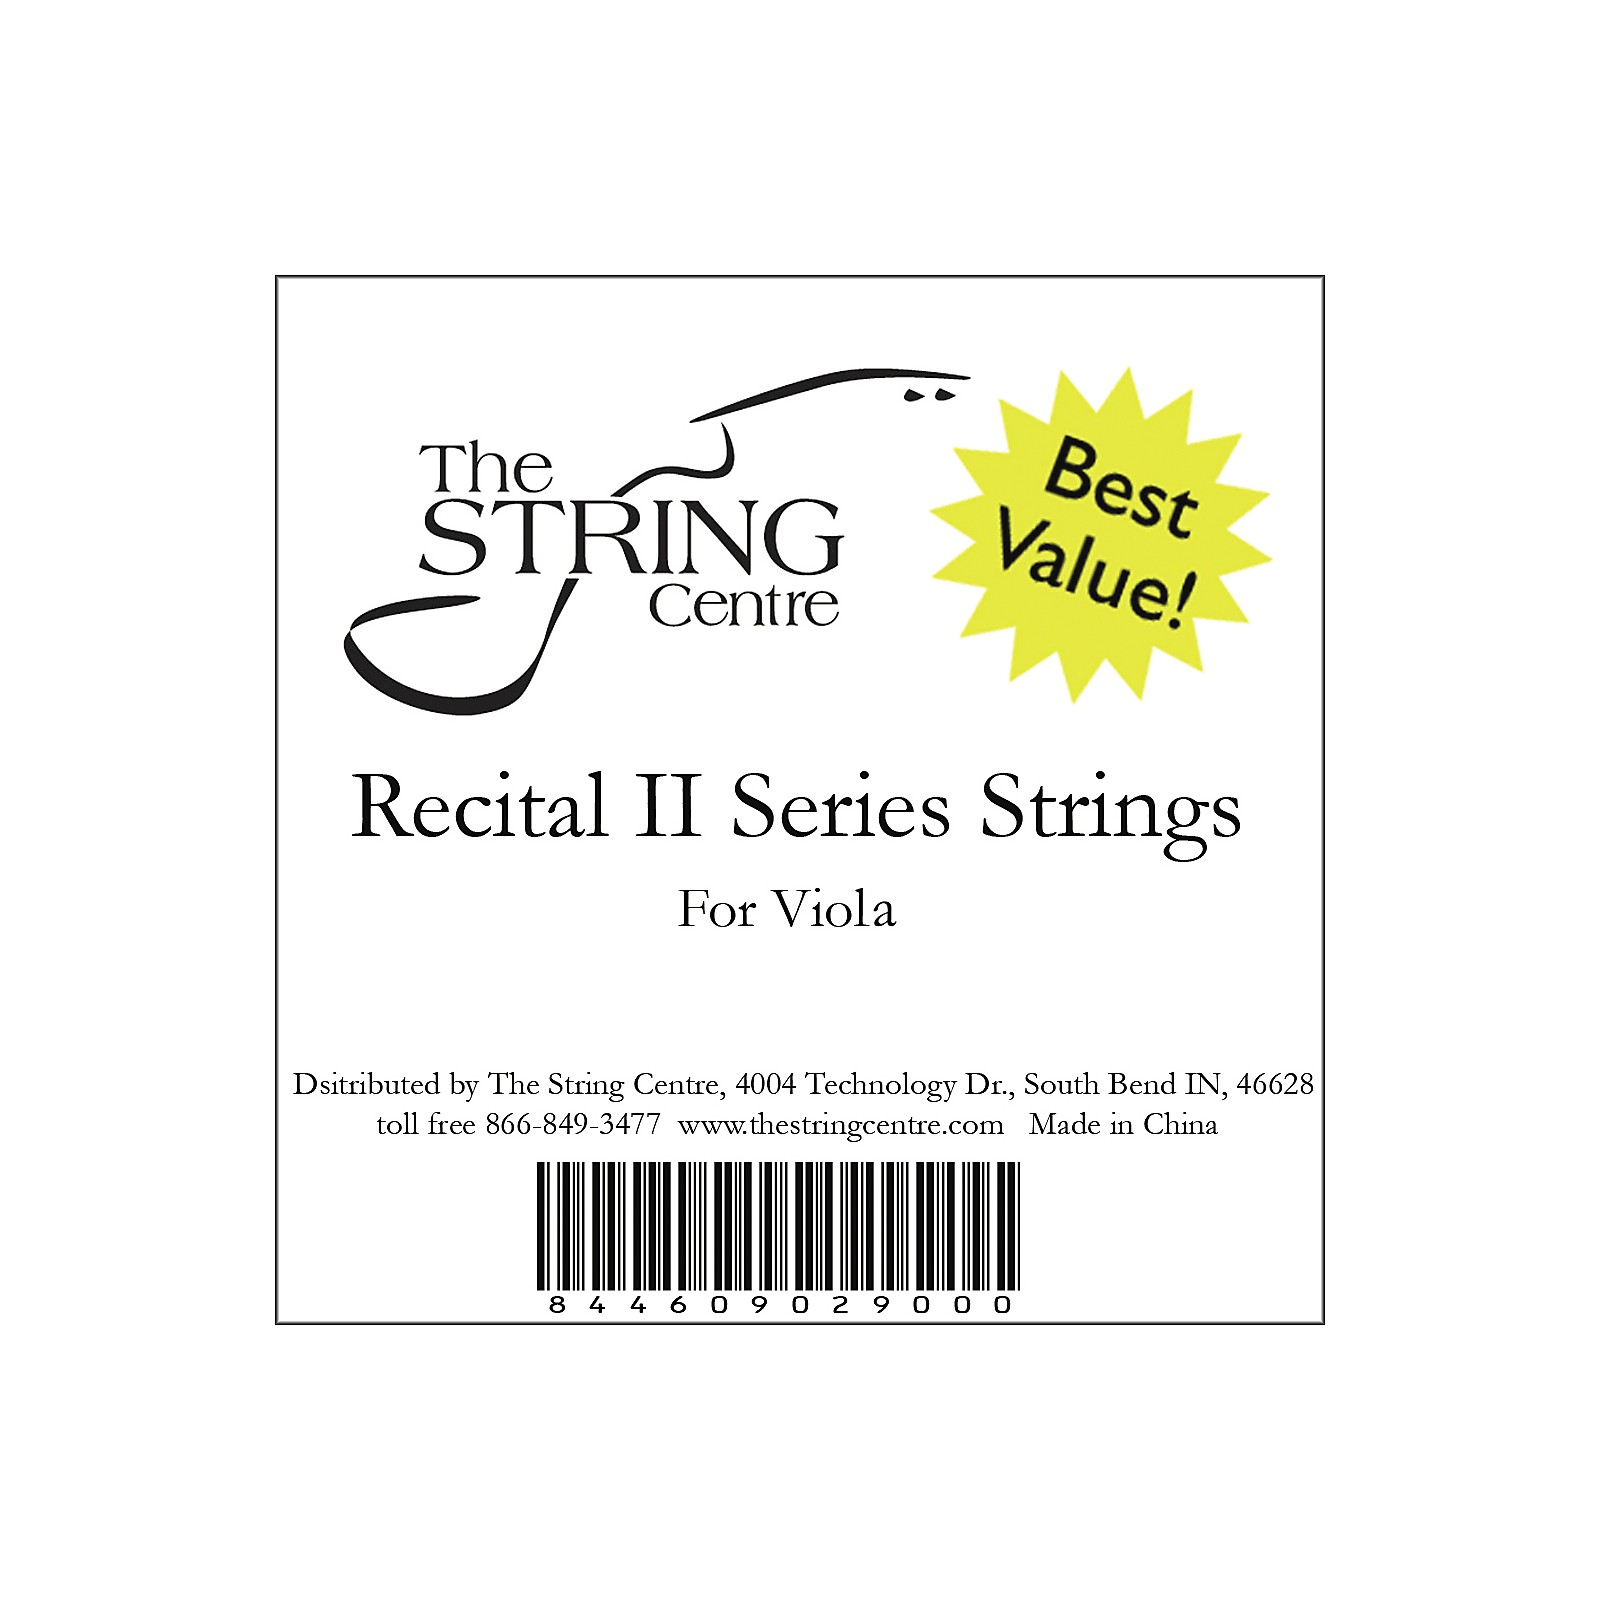 The String Centre Recital II Viola String Set